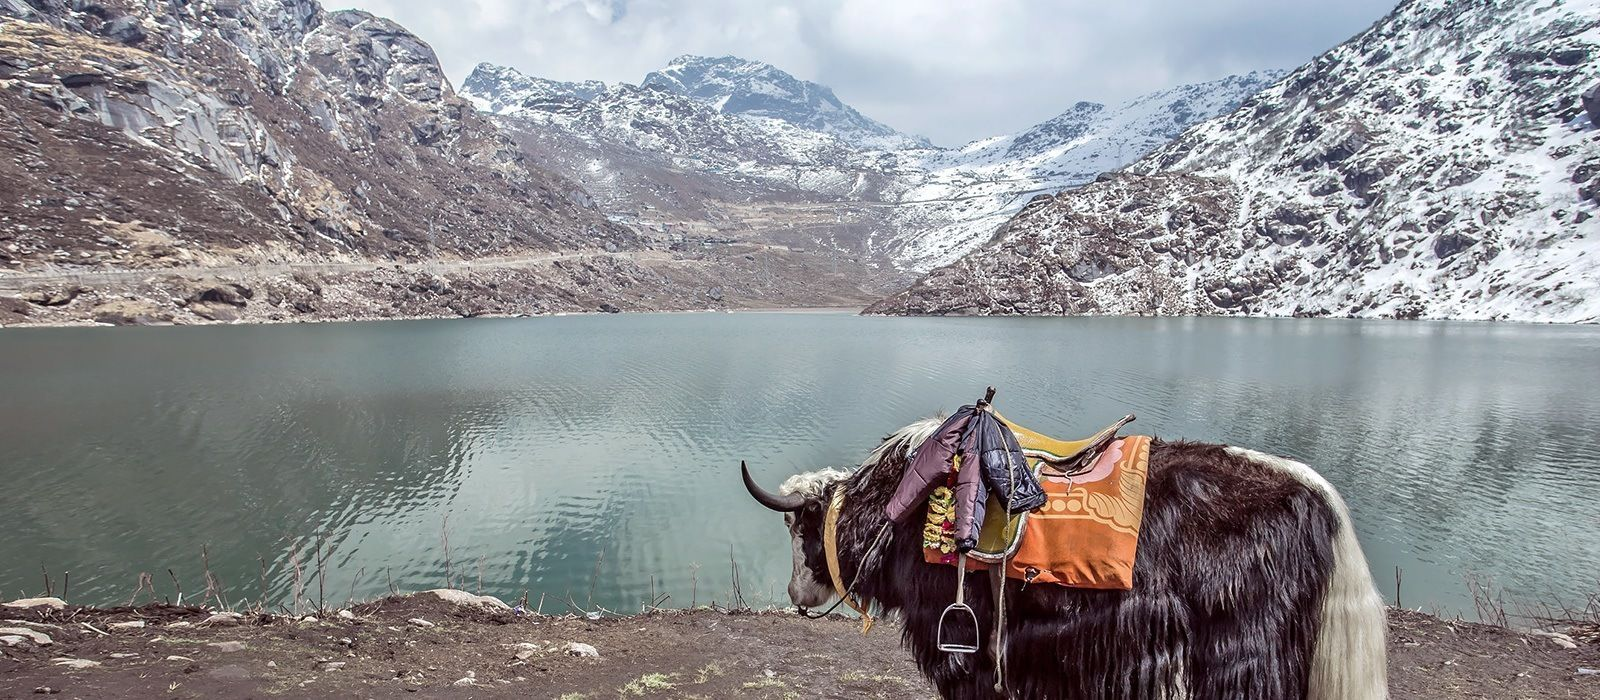 Darjeeling: Teegenuss & Berge Urlaub 7